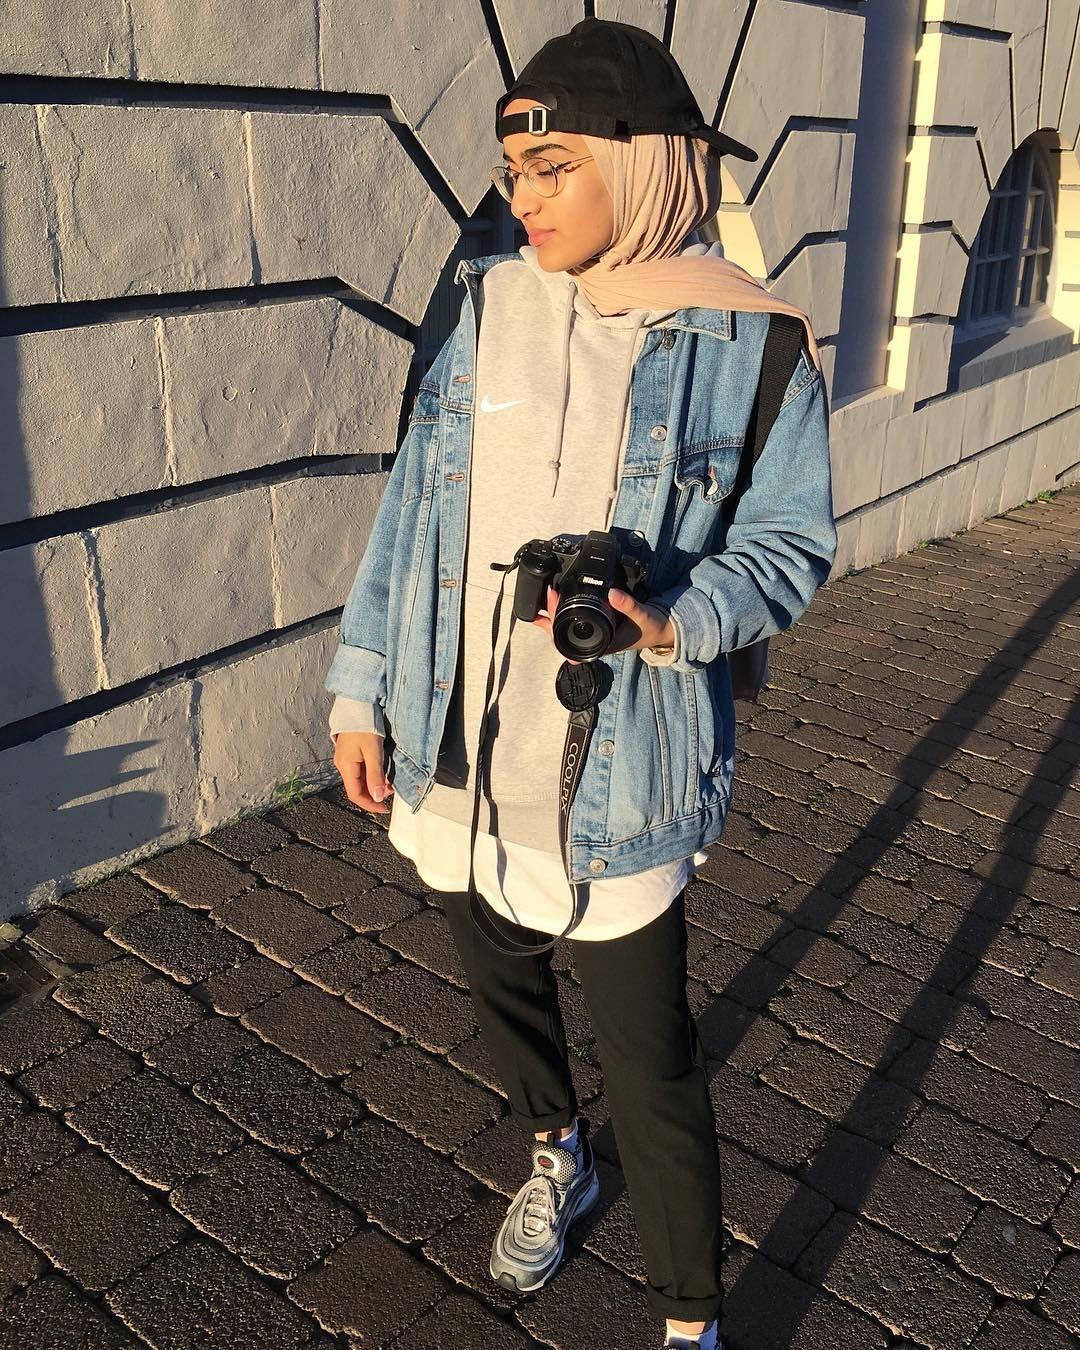 "Photo of A R A B    R OJ A B I S on Instagram: ""Back again🌶 #ulzzang #arabrojabis #photography #outfit #streetwear  #hijabiselegant #chichijab"""